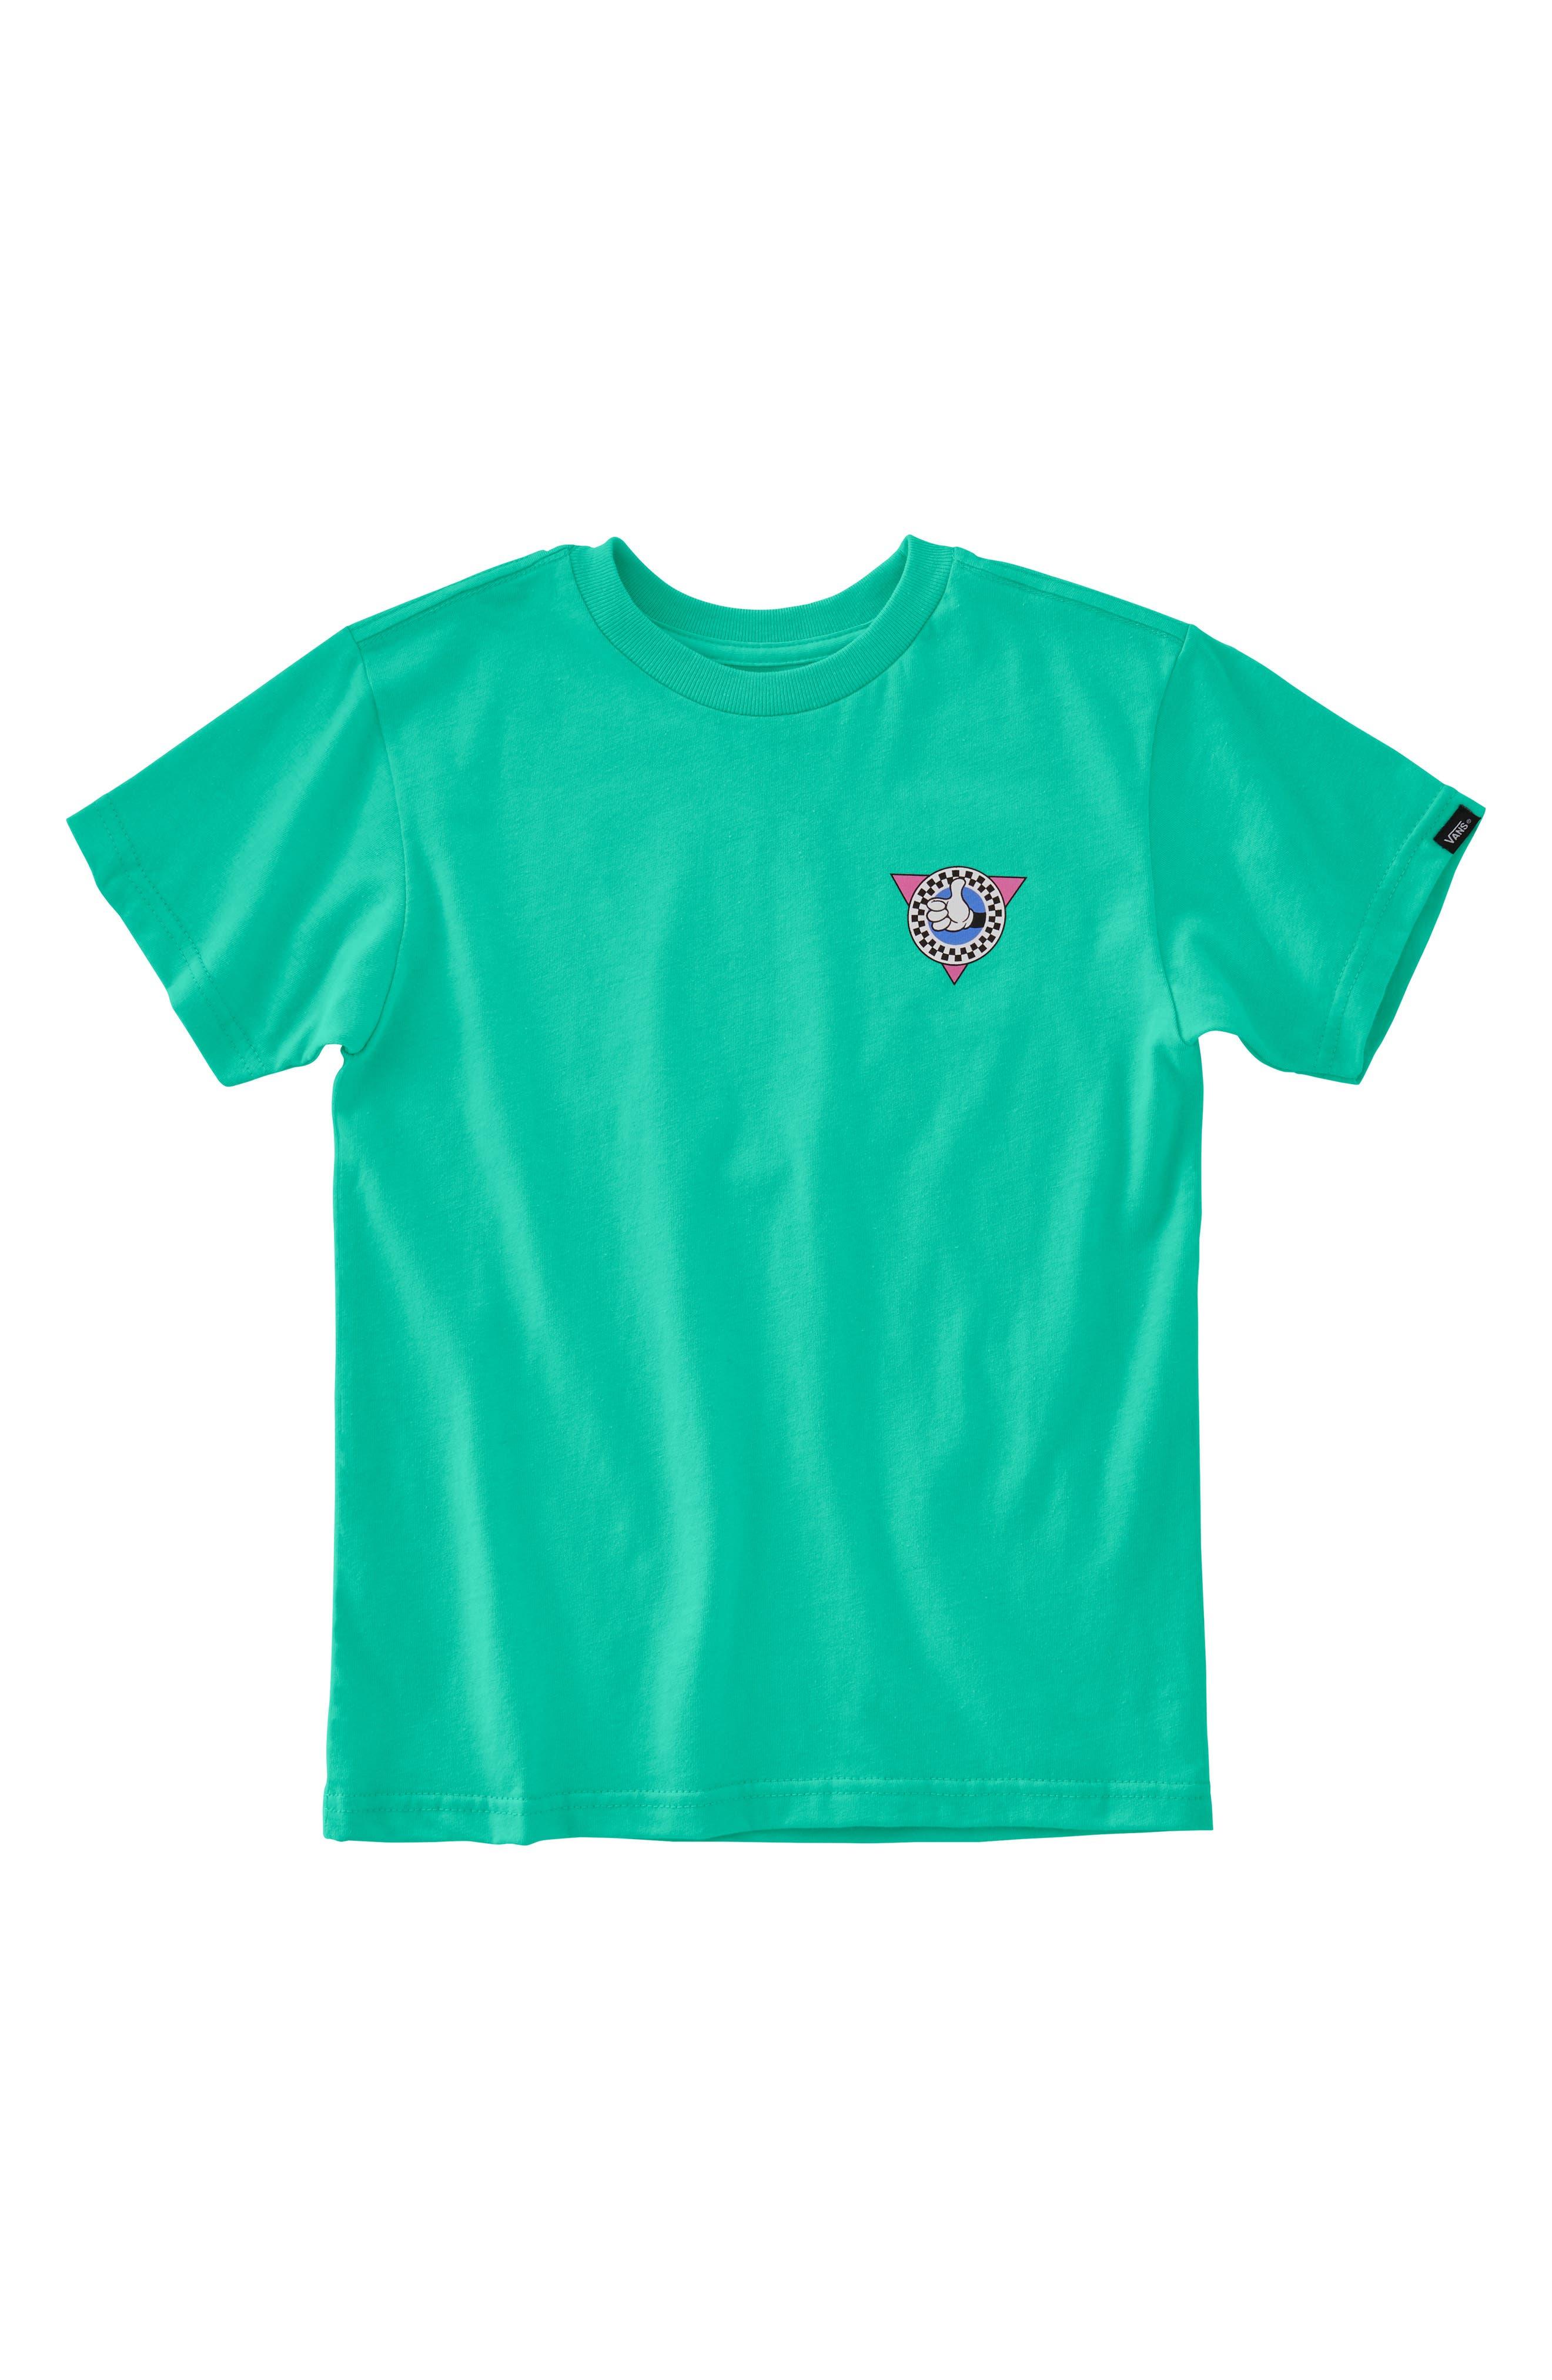 x Disney Mickey's 90th Anniversary Classic T-Shirt,                         Main,                         color, 300